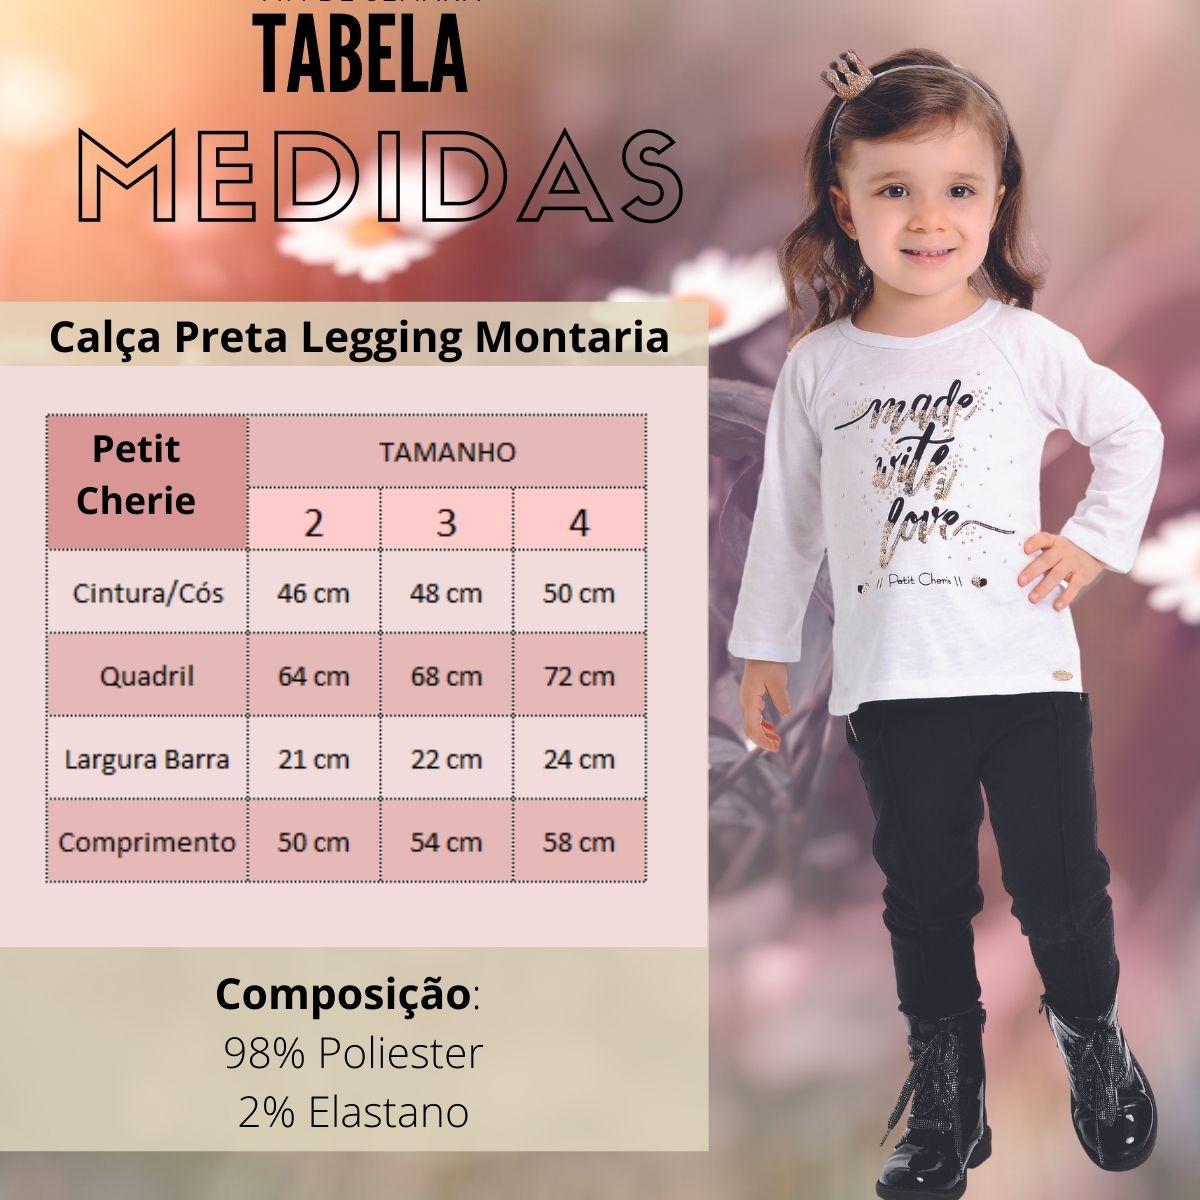 Calça Preta Legging Montaria Infantil Com Elastano Petit Cherie